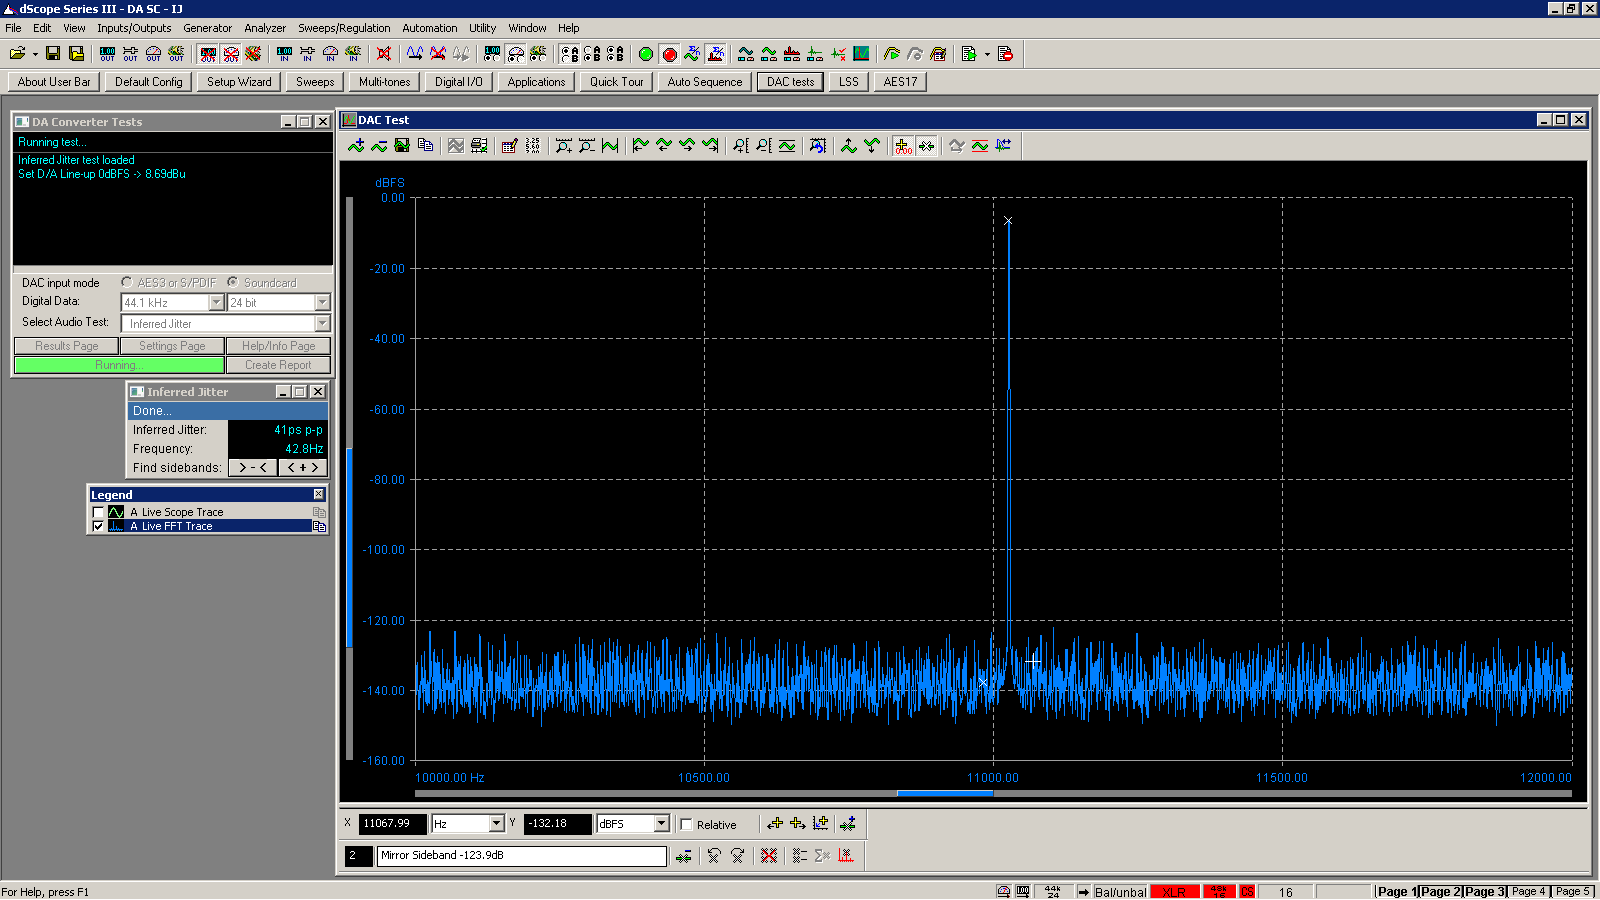 20160812 Modi MB SE inferred jitter - 2KHz BW - USB.png